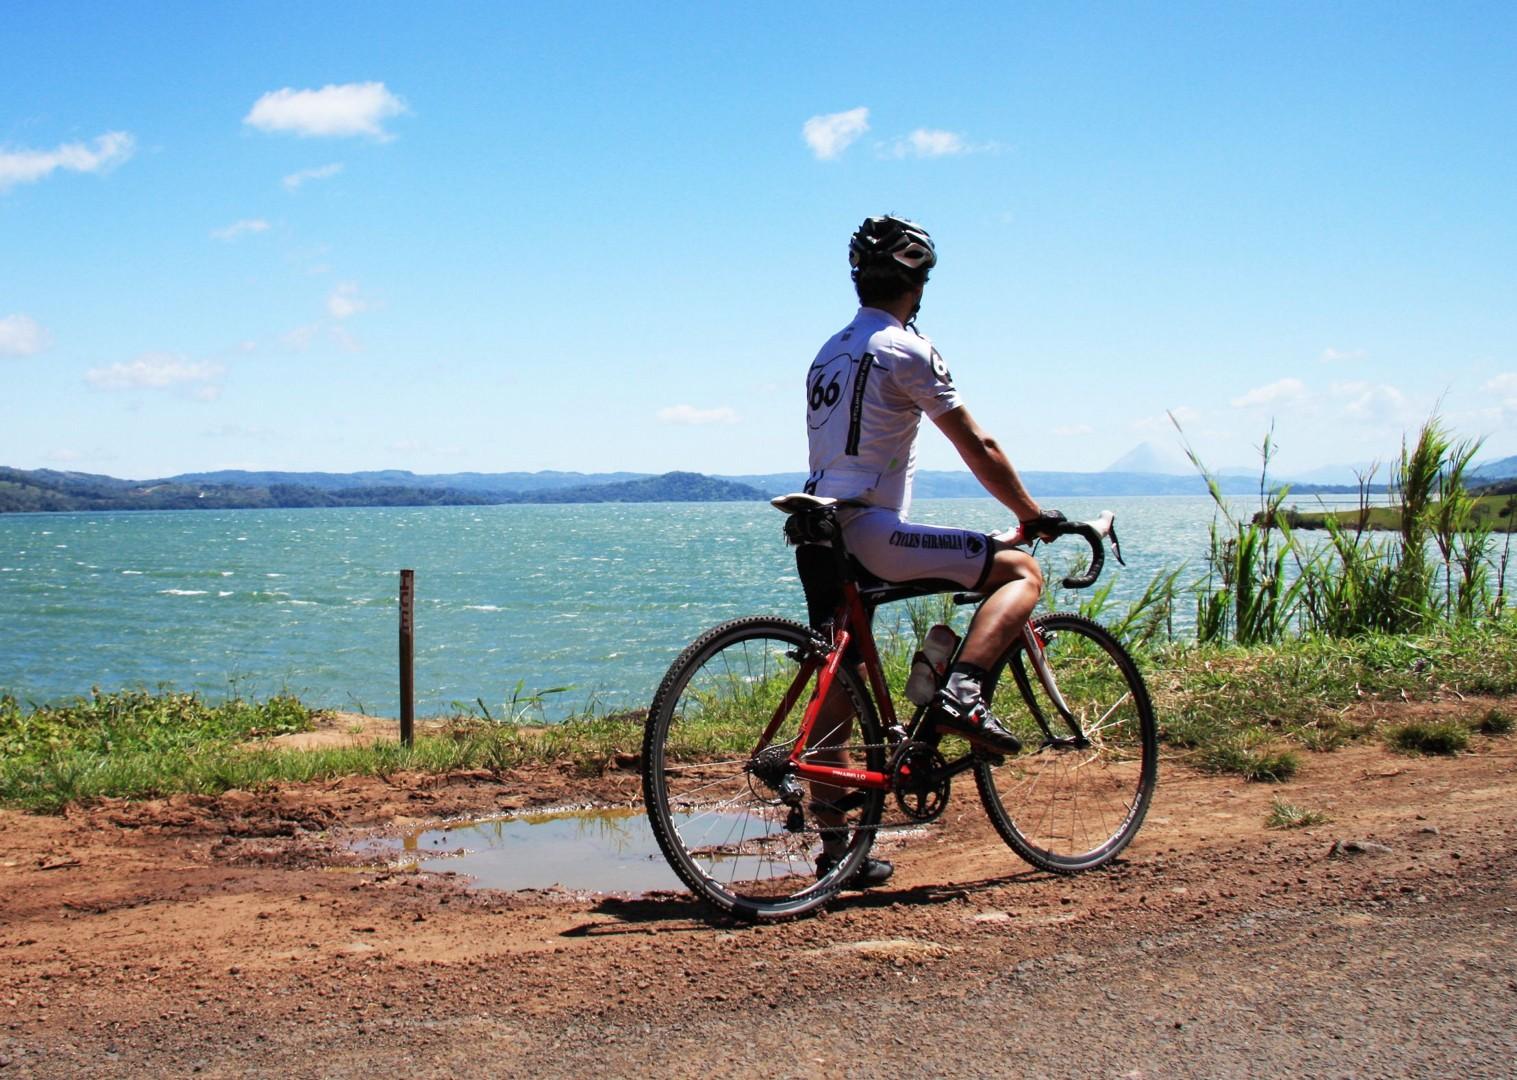 pacific-coast-costa-rica-guided-road-cycling-holiday-ruta-de-los-volcanes.jpg - Costa Rica - Ruta de los Volcanes - Road Cycling